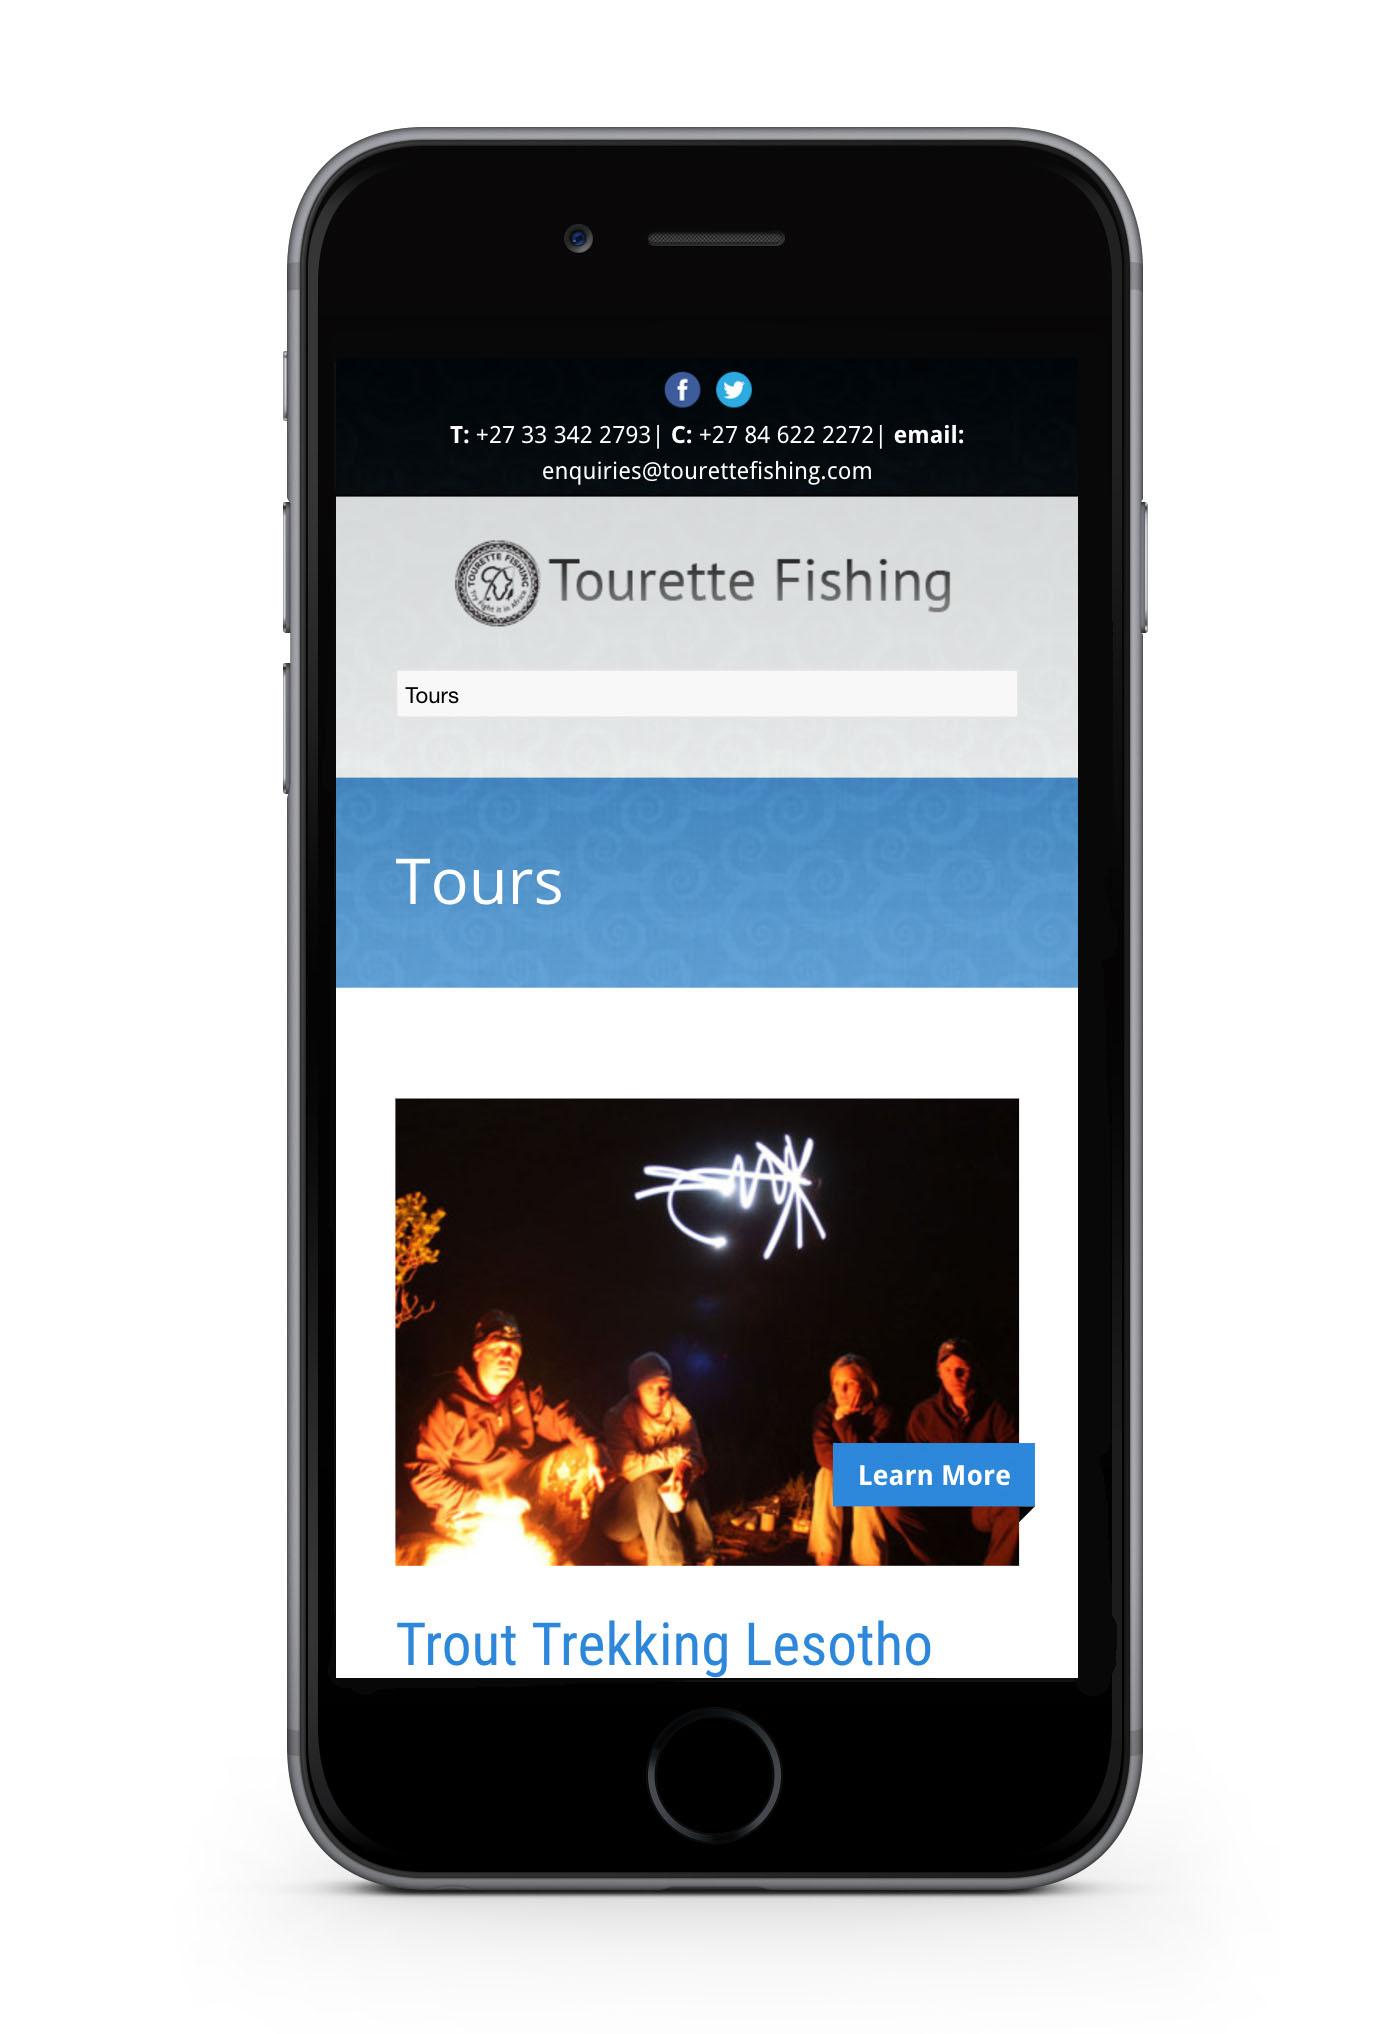 tourette fishing web-design-portfolio-webdoor-responsive-web-design-agency-hillcrest-kwazulu-natal-phone